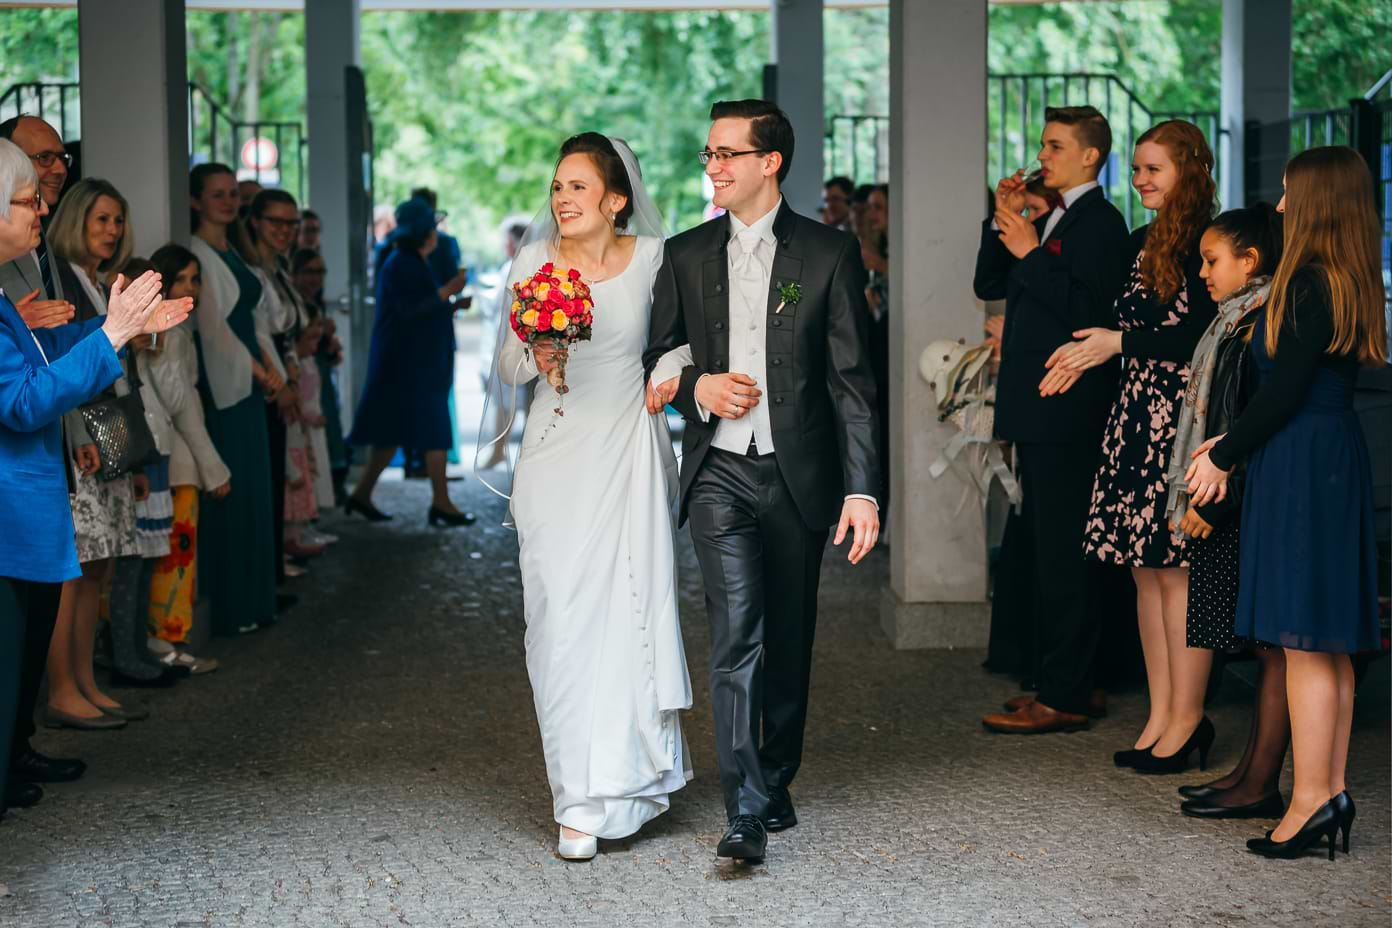 Ankunft des Brautpaares beim Empfang in Kreuzberg